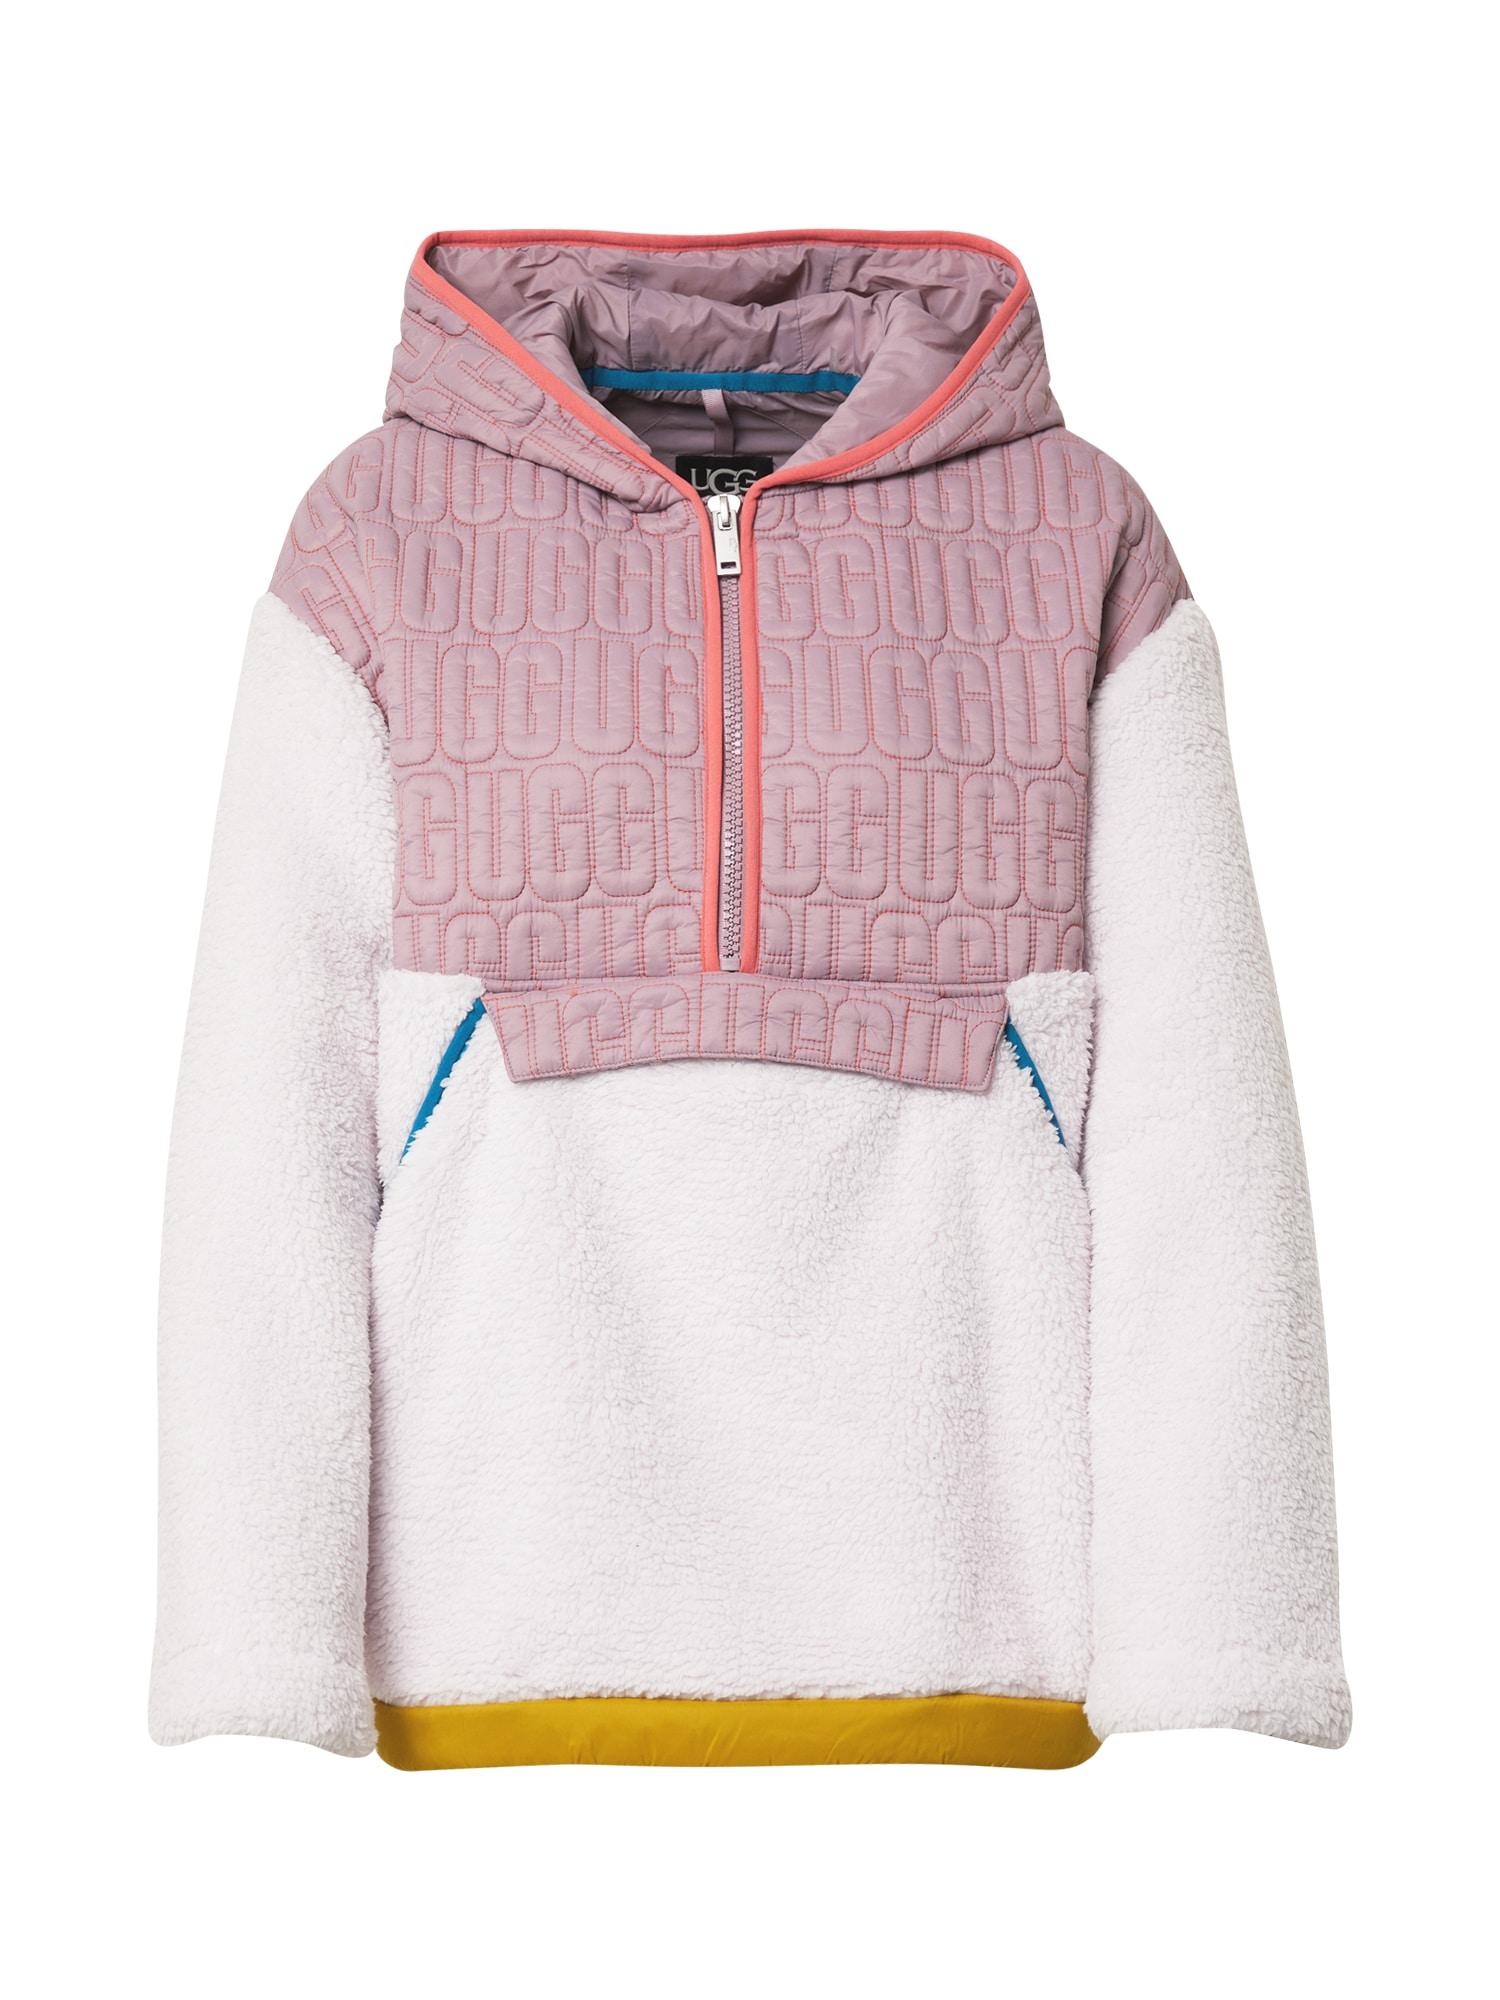 UGG Megztinis 'IGGY' rožinė / balta